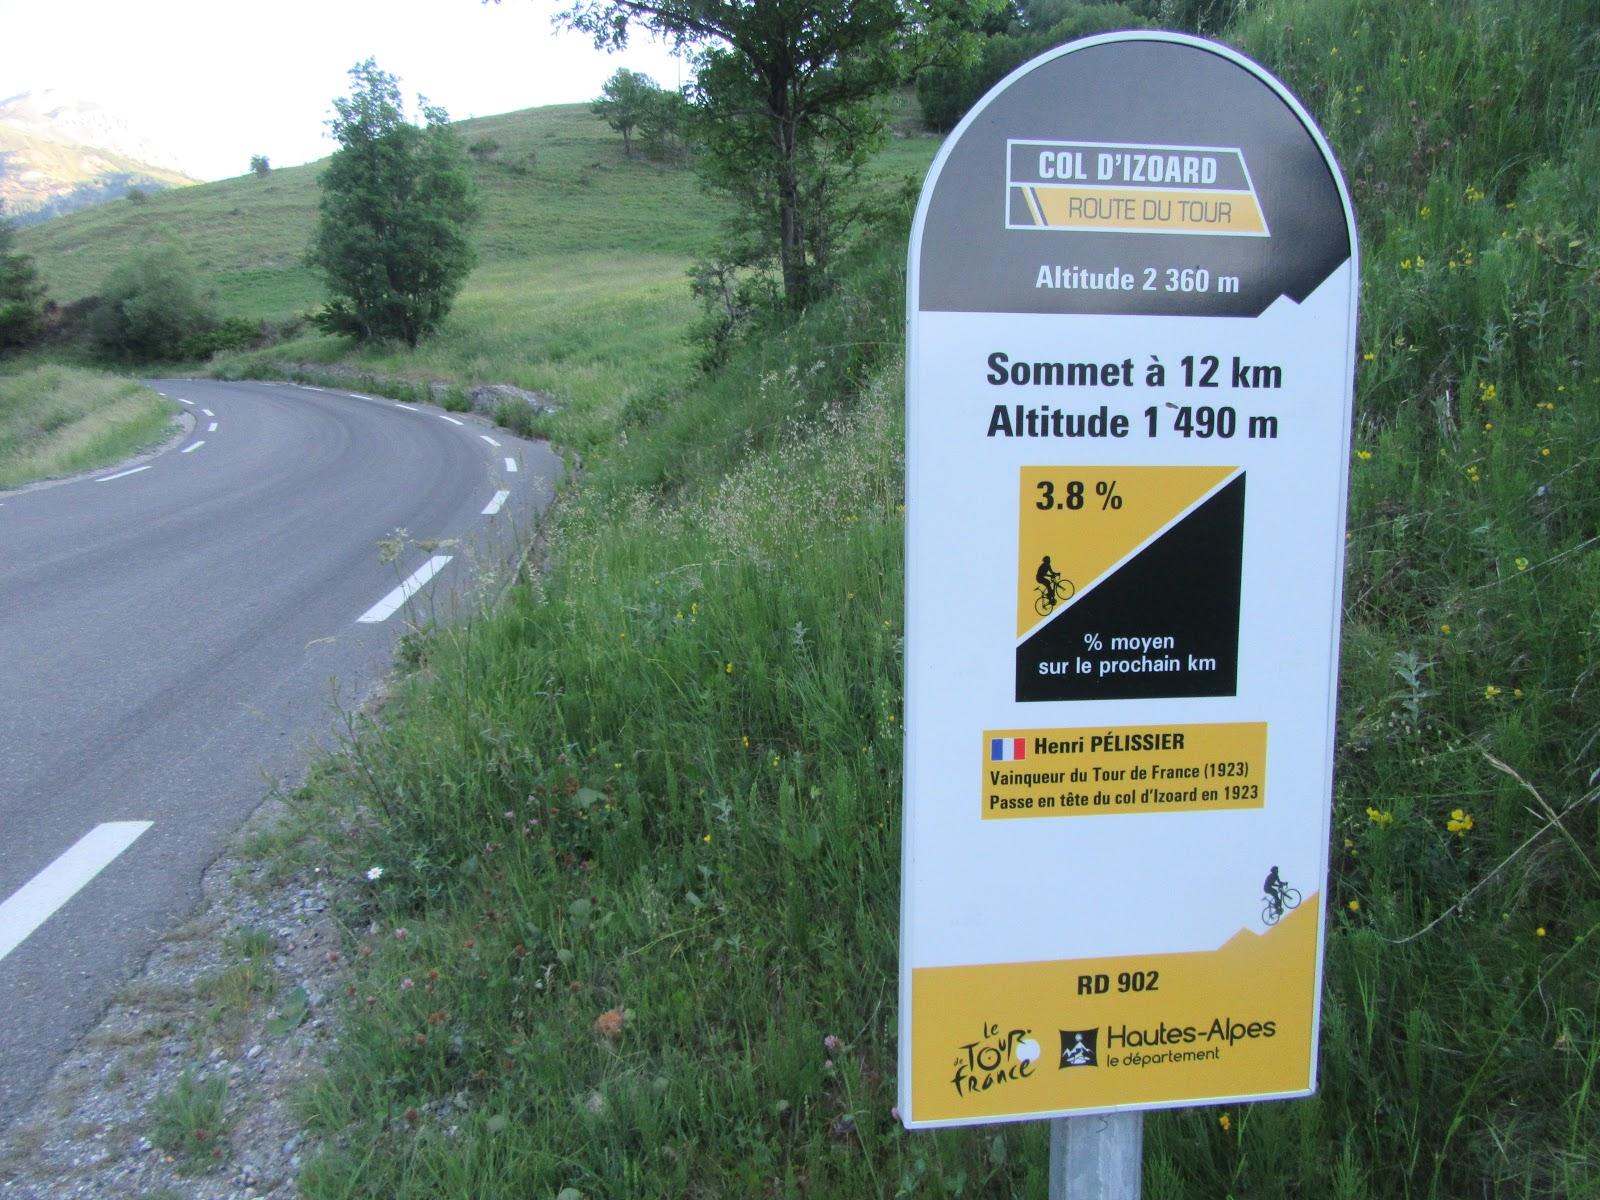 Bike climb Col d'Izoard Guillestre Tour de France kilometer signs on roadway